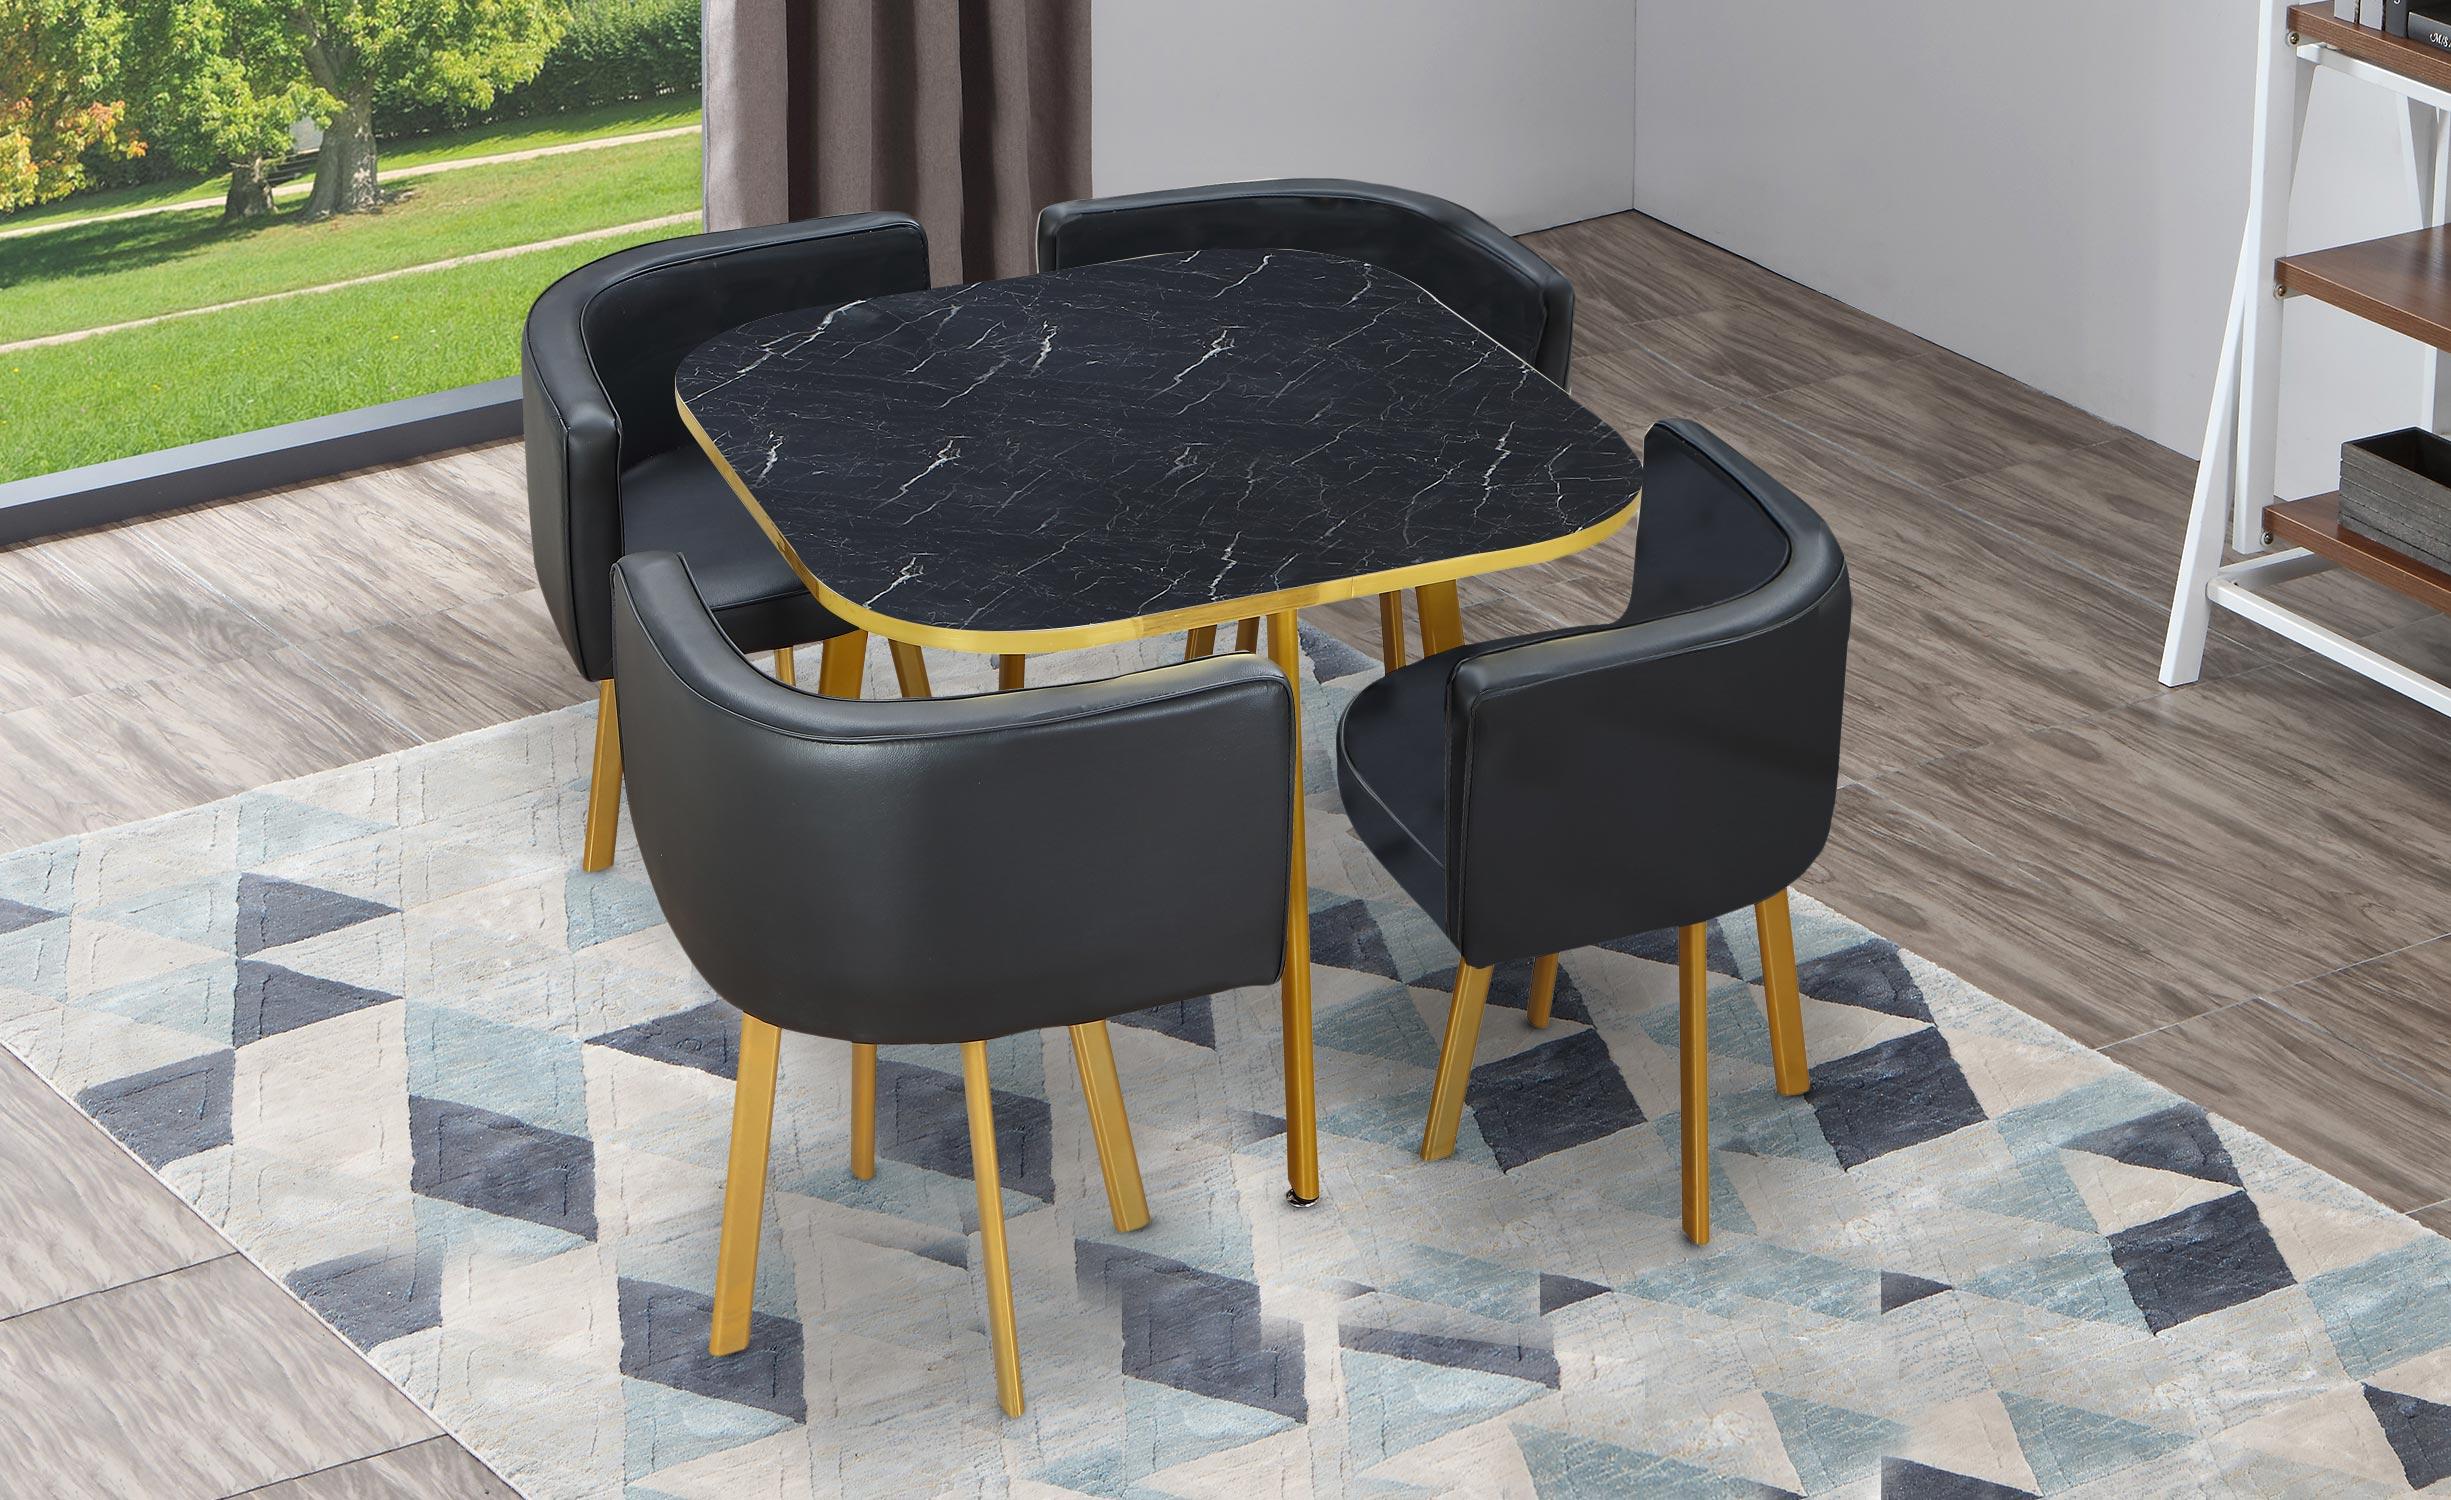 Oslo goud marmereffect en zwarte simili tafel en stoelen